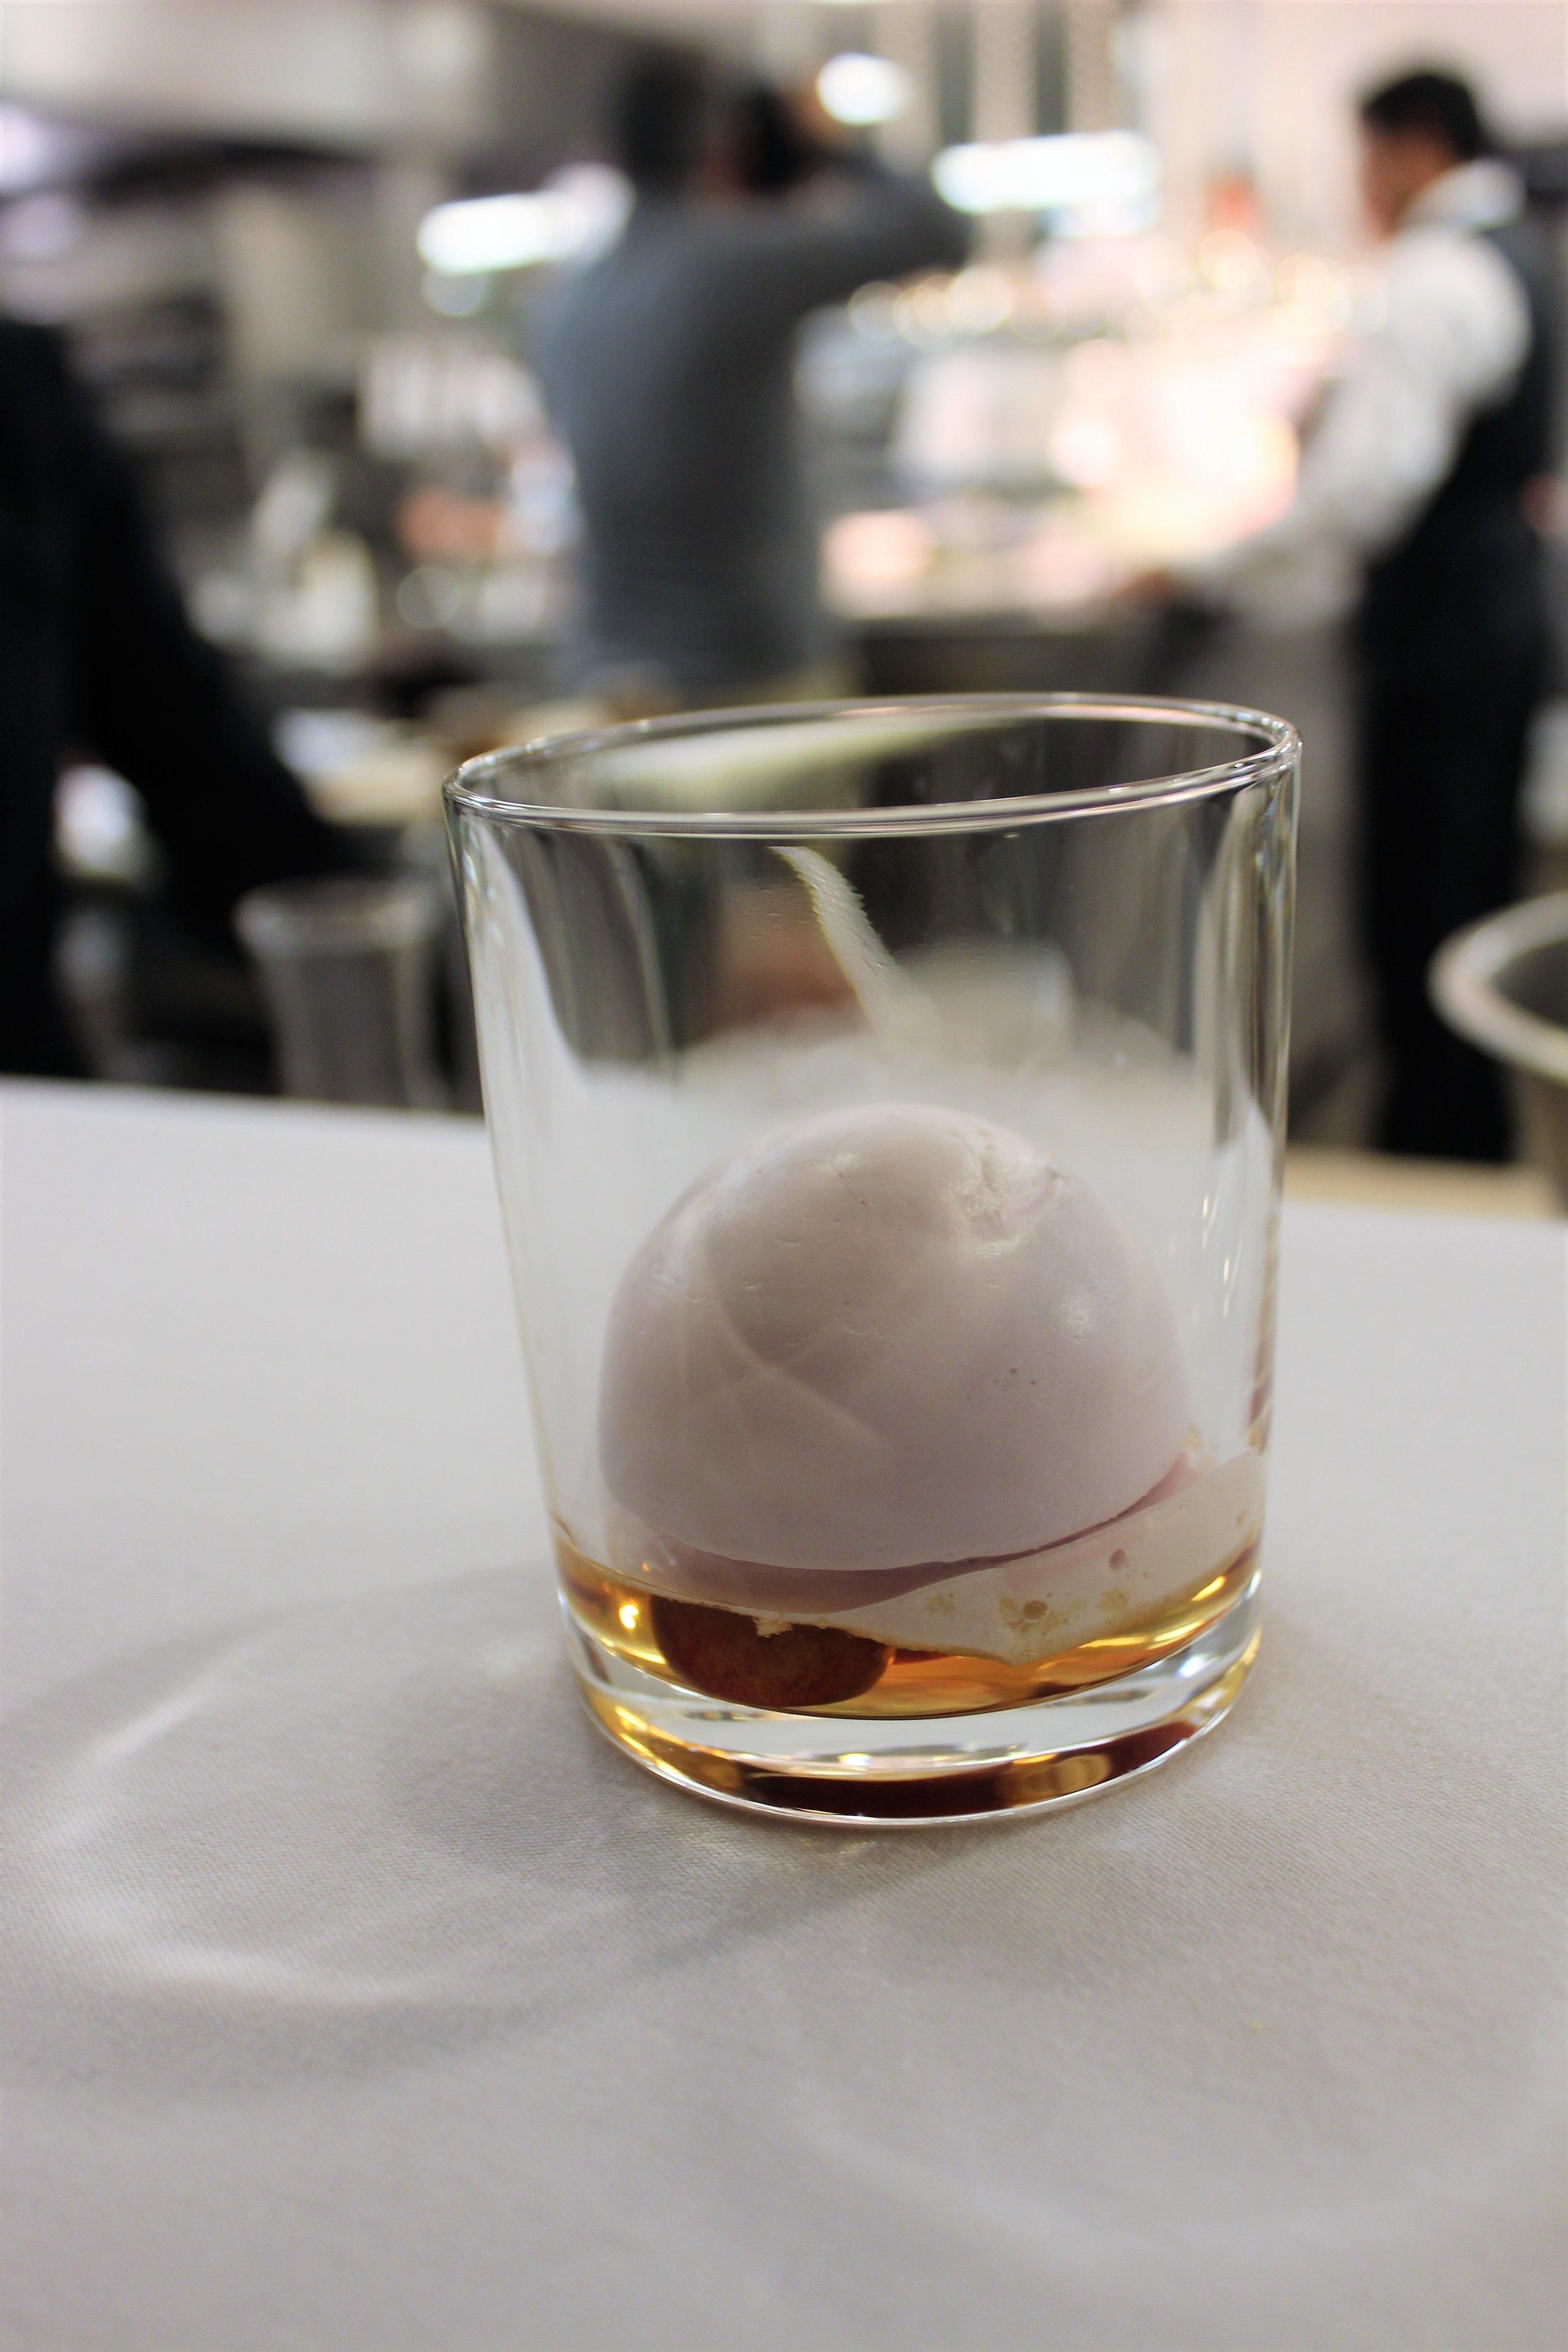 Liquid-Nitrogen-Cocktail-at-Eleven-Madison-Park-in-New-York-City-3.JPG